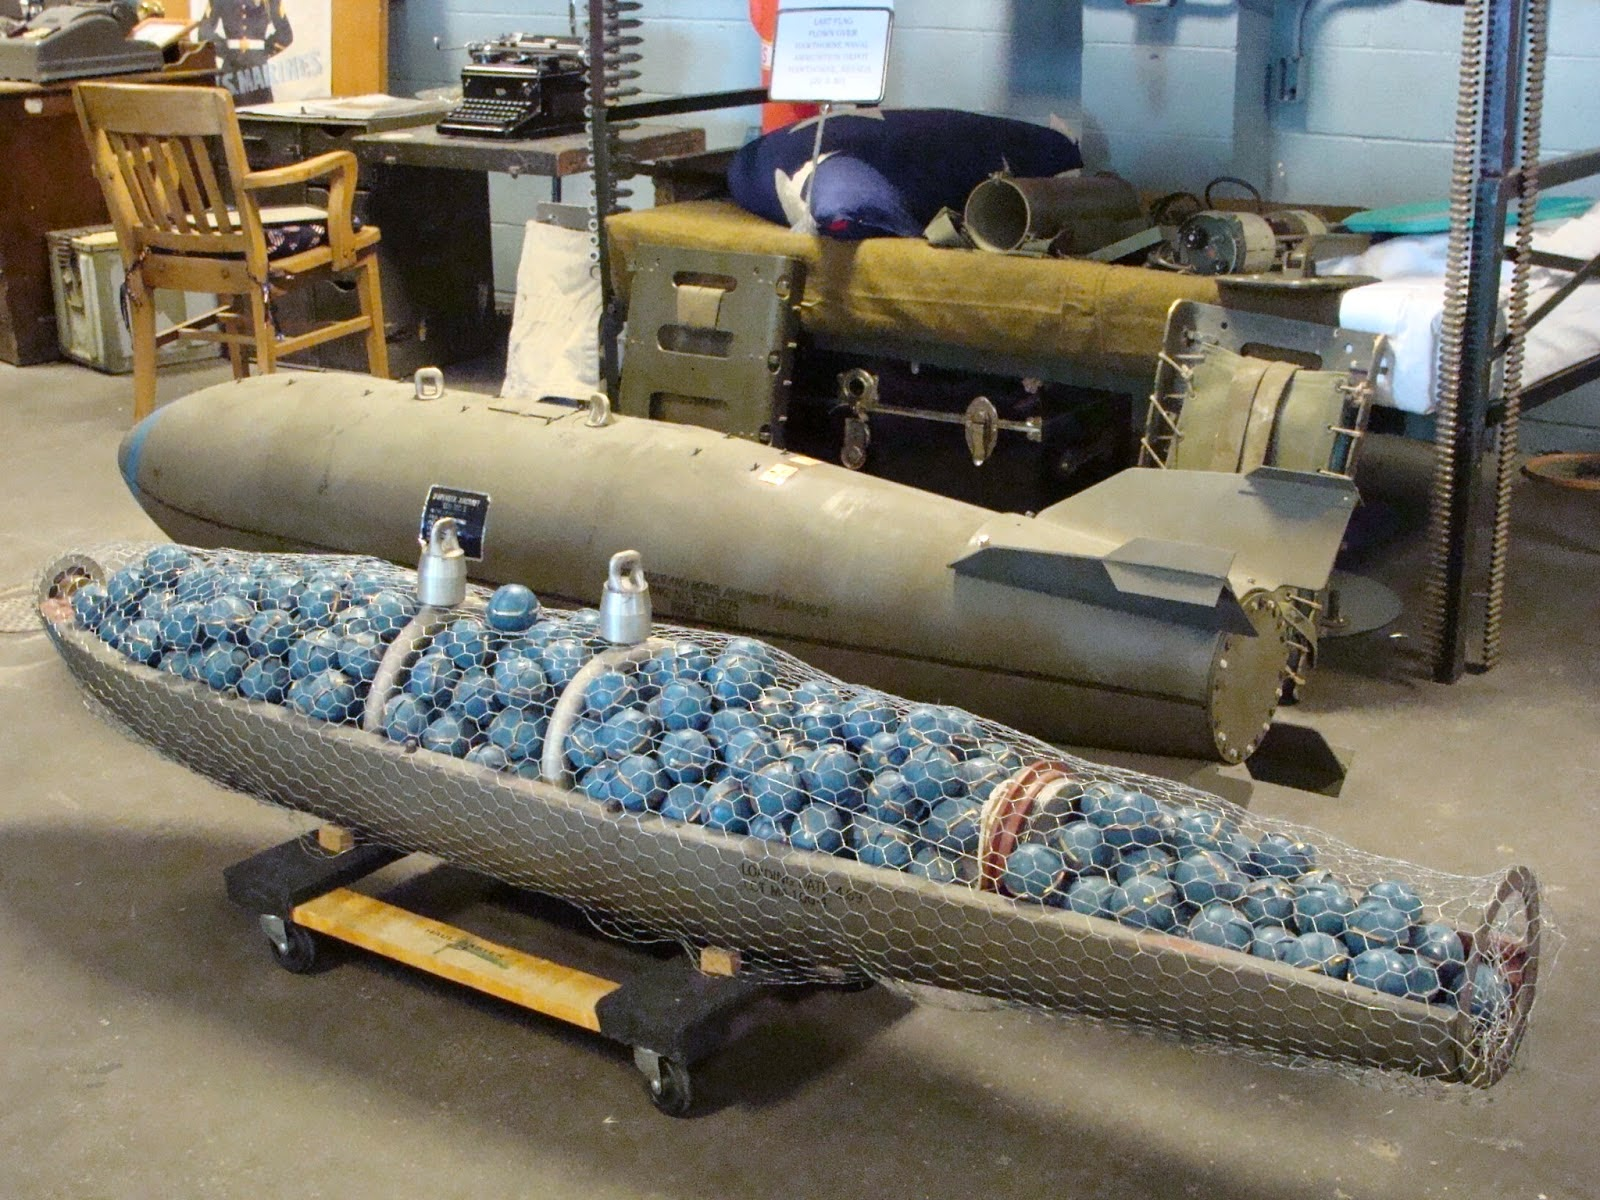 Bom fosforus putih Rejim Zionis dikecam guna bom kimia